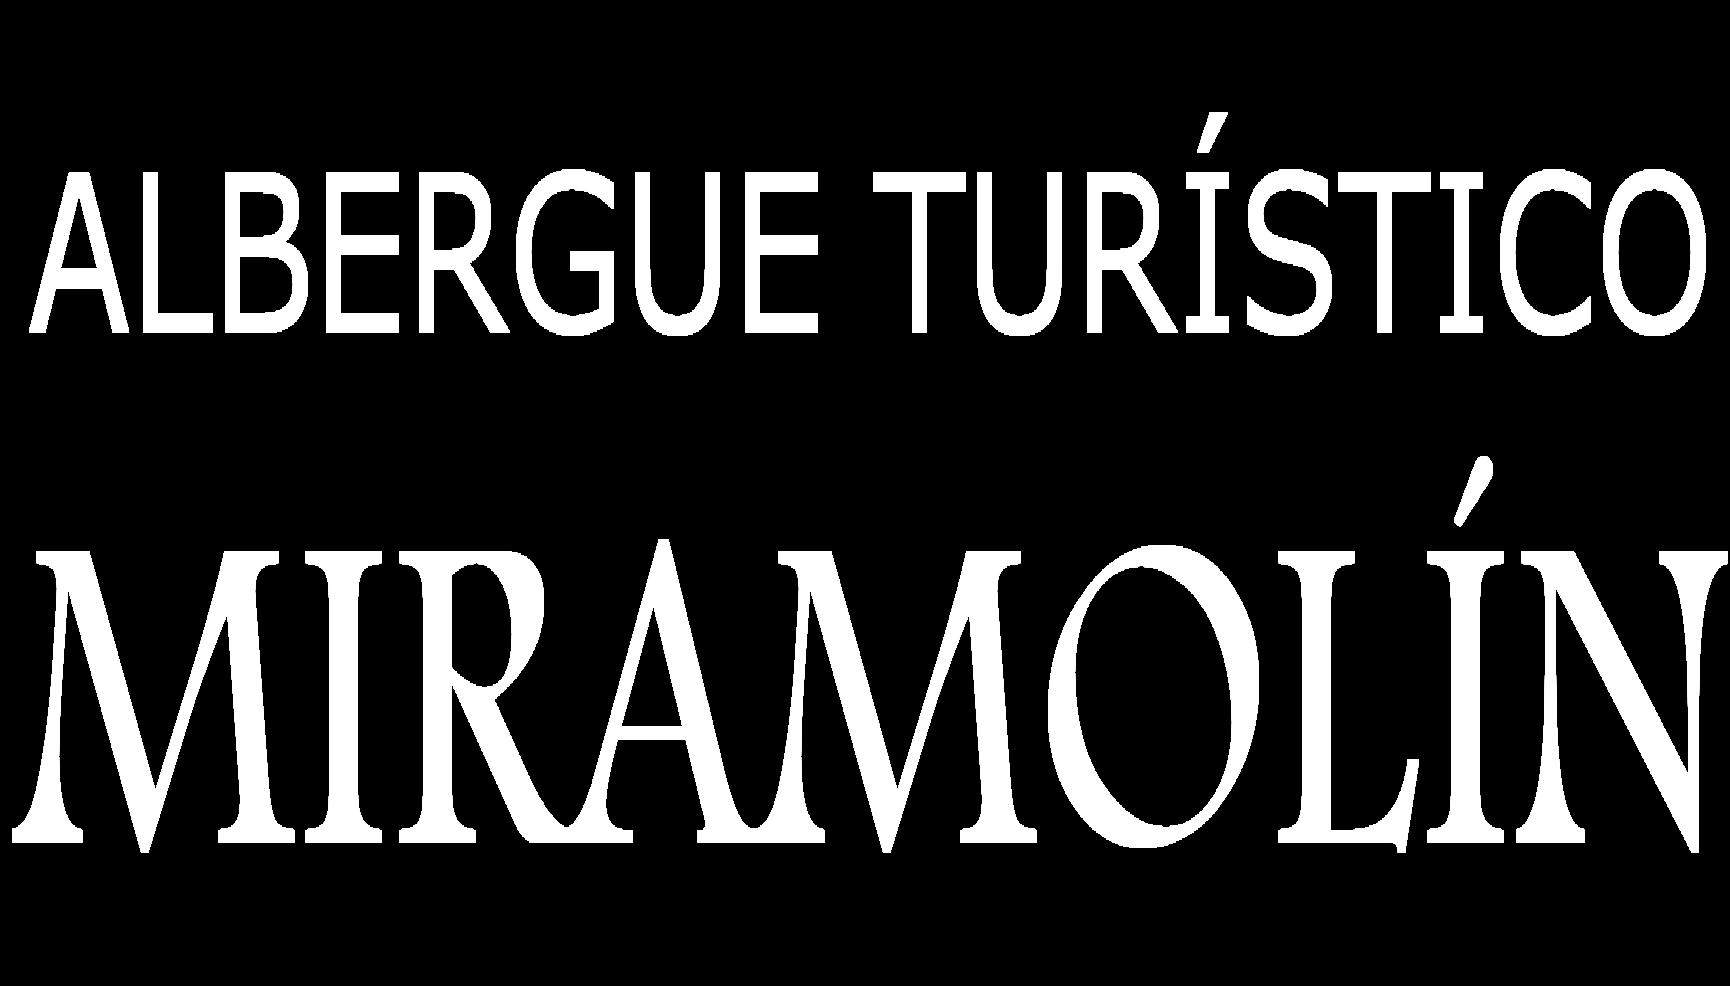 Albergue Turístico Miramolín